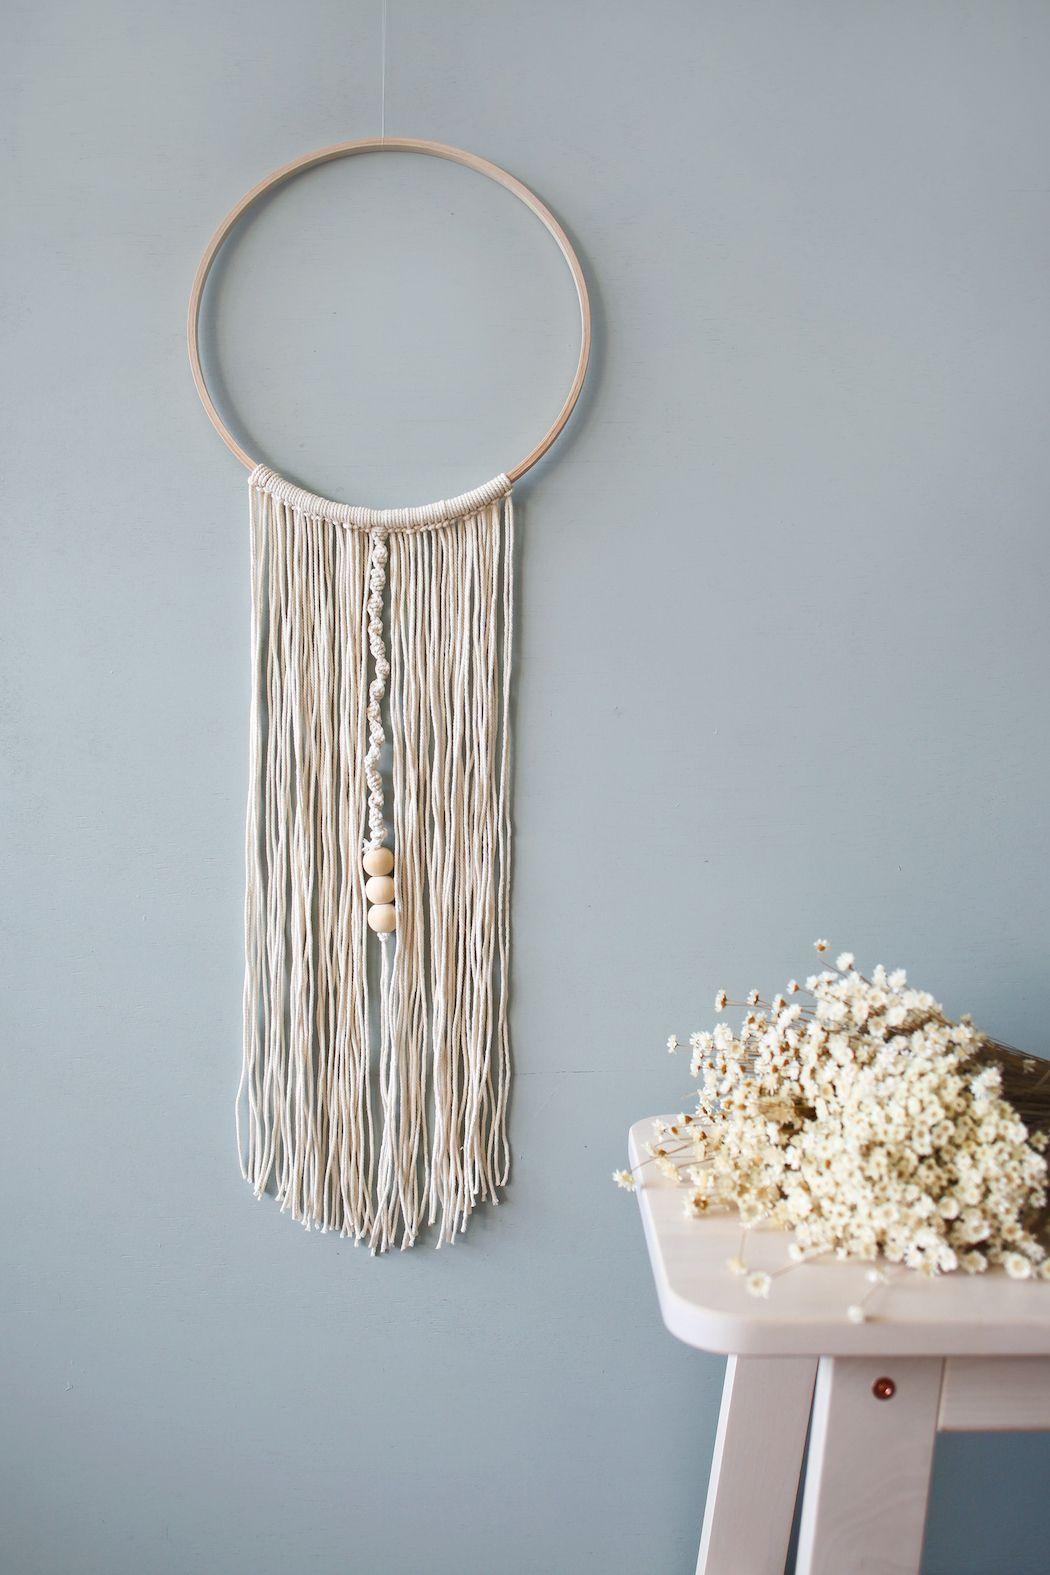 diy yarn wall hanging diy pinterest diy decor and yarn wall hanging. Black Bedroom Furniture Sets. Home Design Ideas